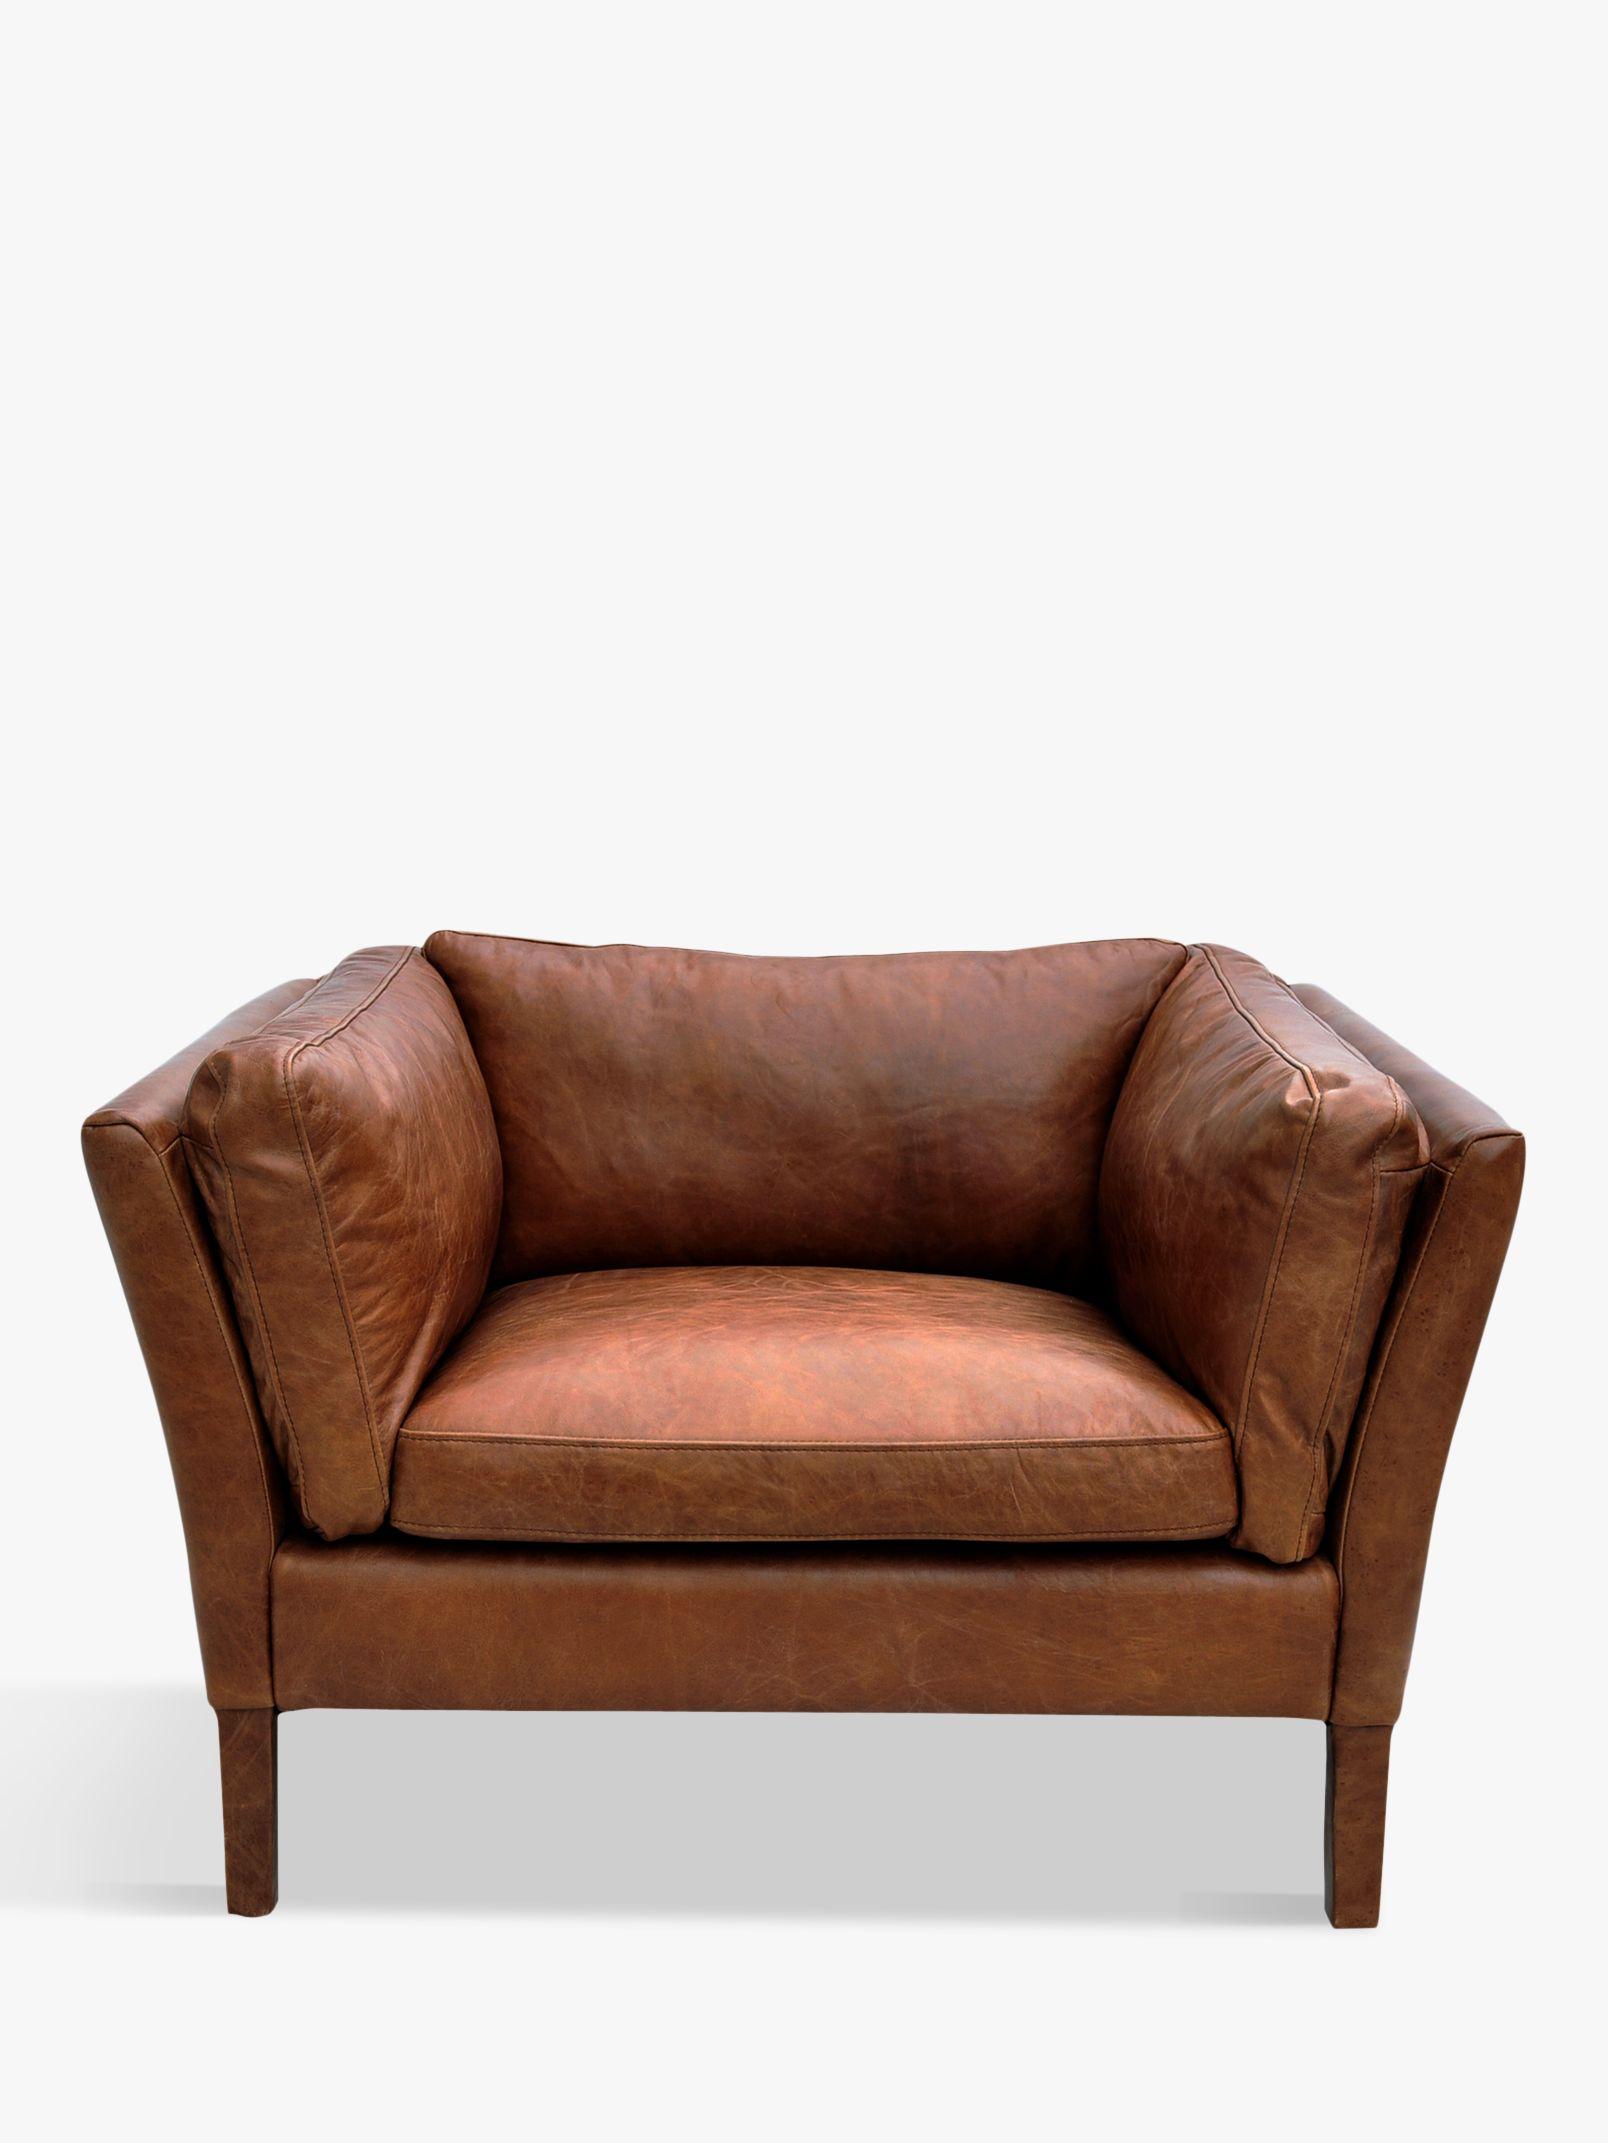 Halo Halo Groucho Aniline Leather Armchair